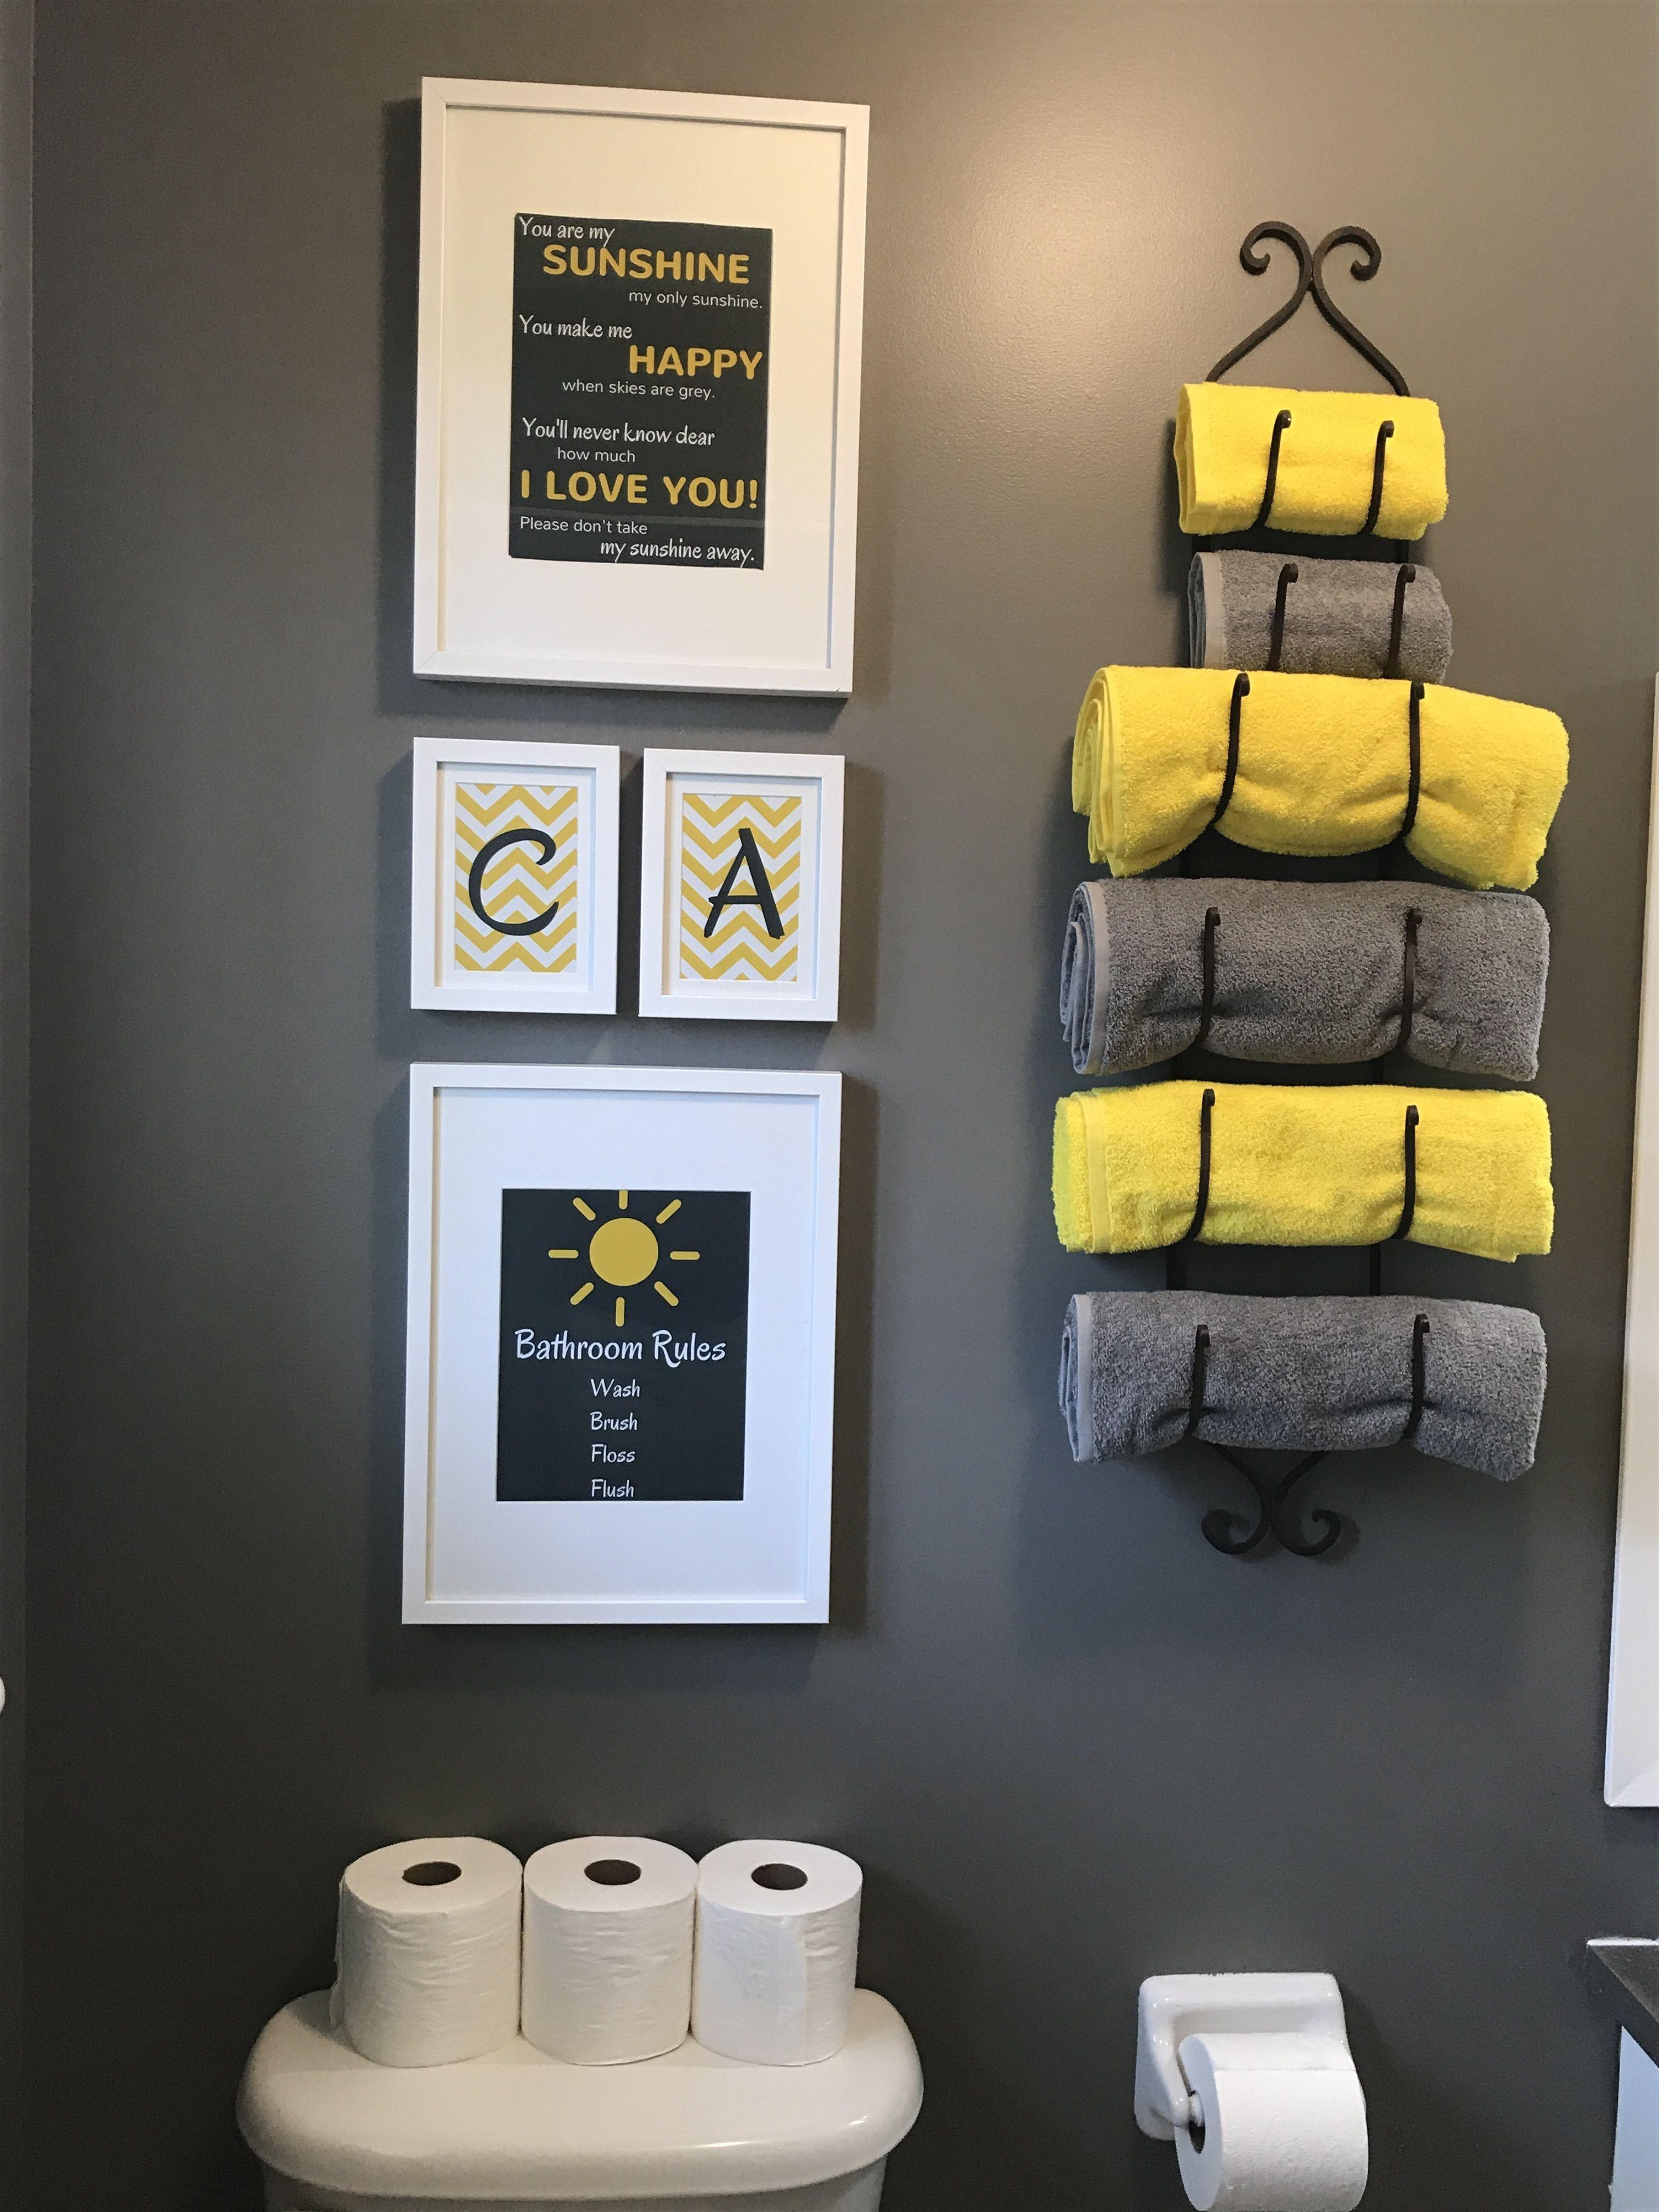 Yellow and Gray Bathroom Decor Elegant Diy Bathroom Yellow and Grey From Ikea Frames Ikea and Photos Were Created Using Canva